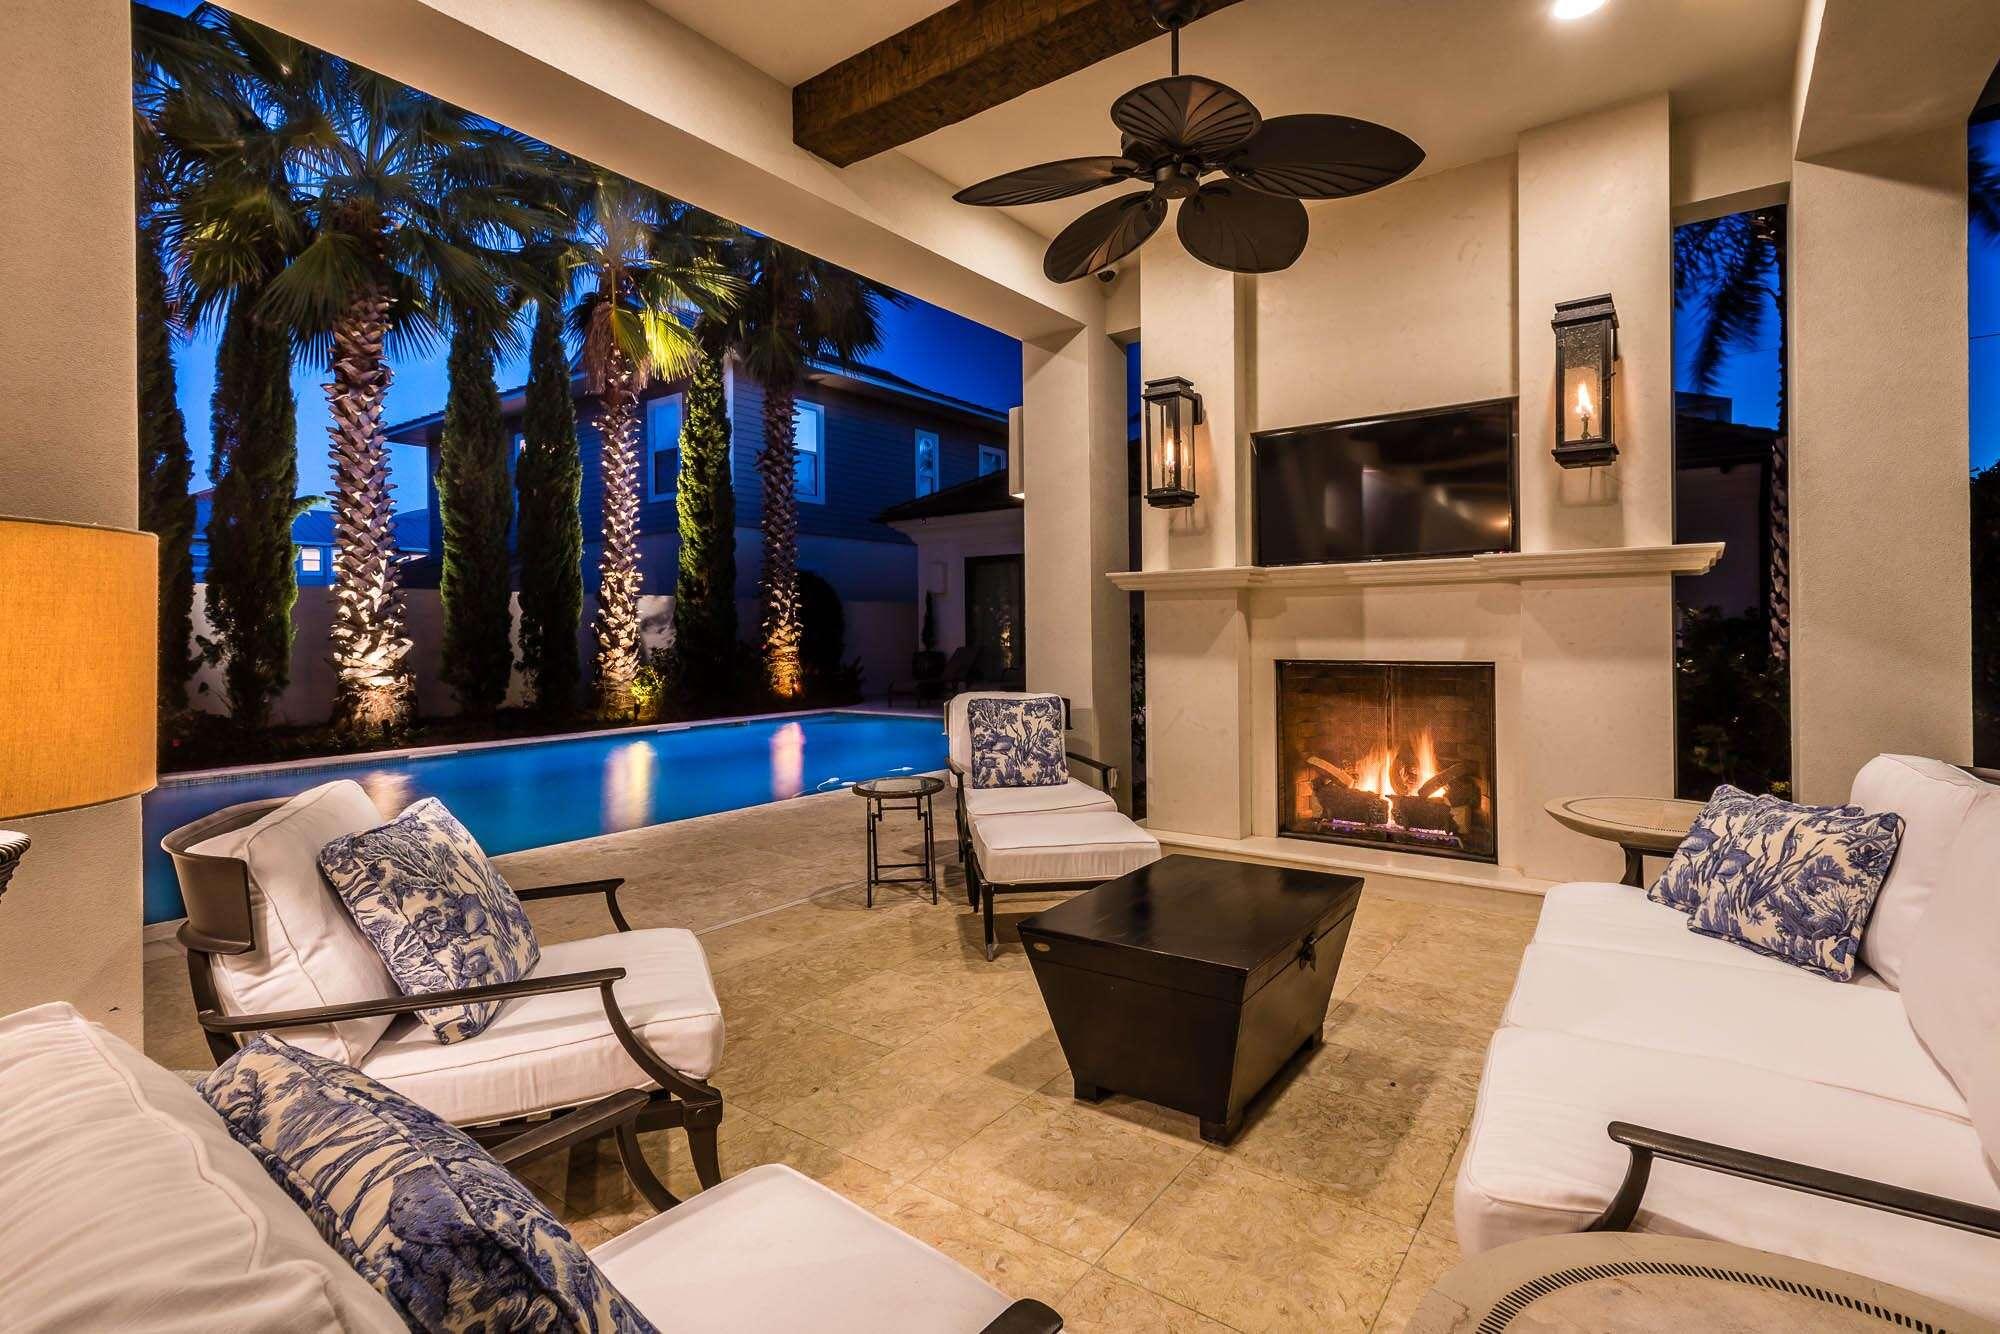 Single Family for Sale at 39 Sarasota Street Miramar Beach, Florida 32550 United States